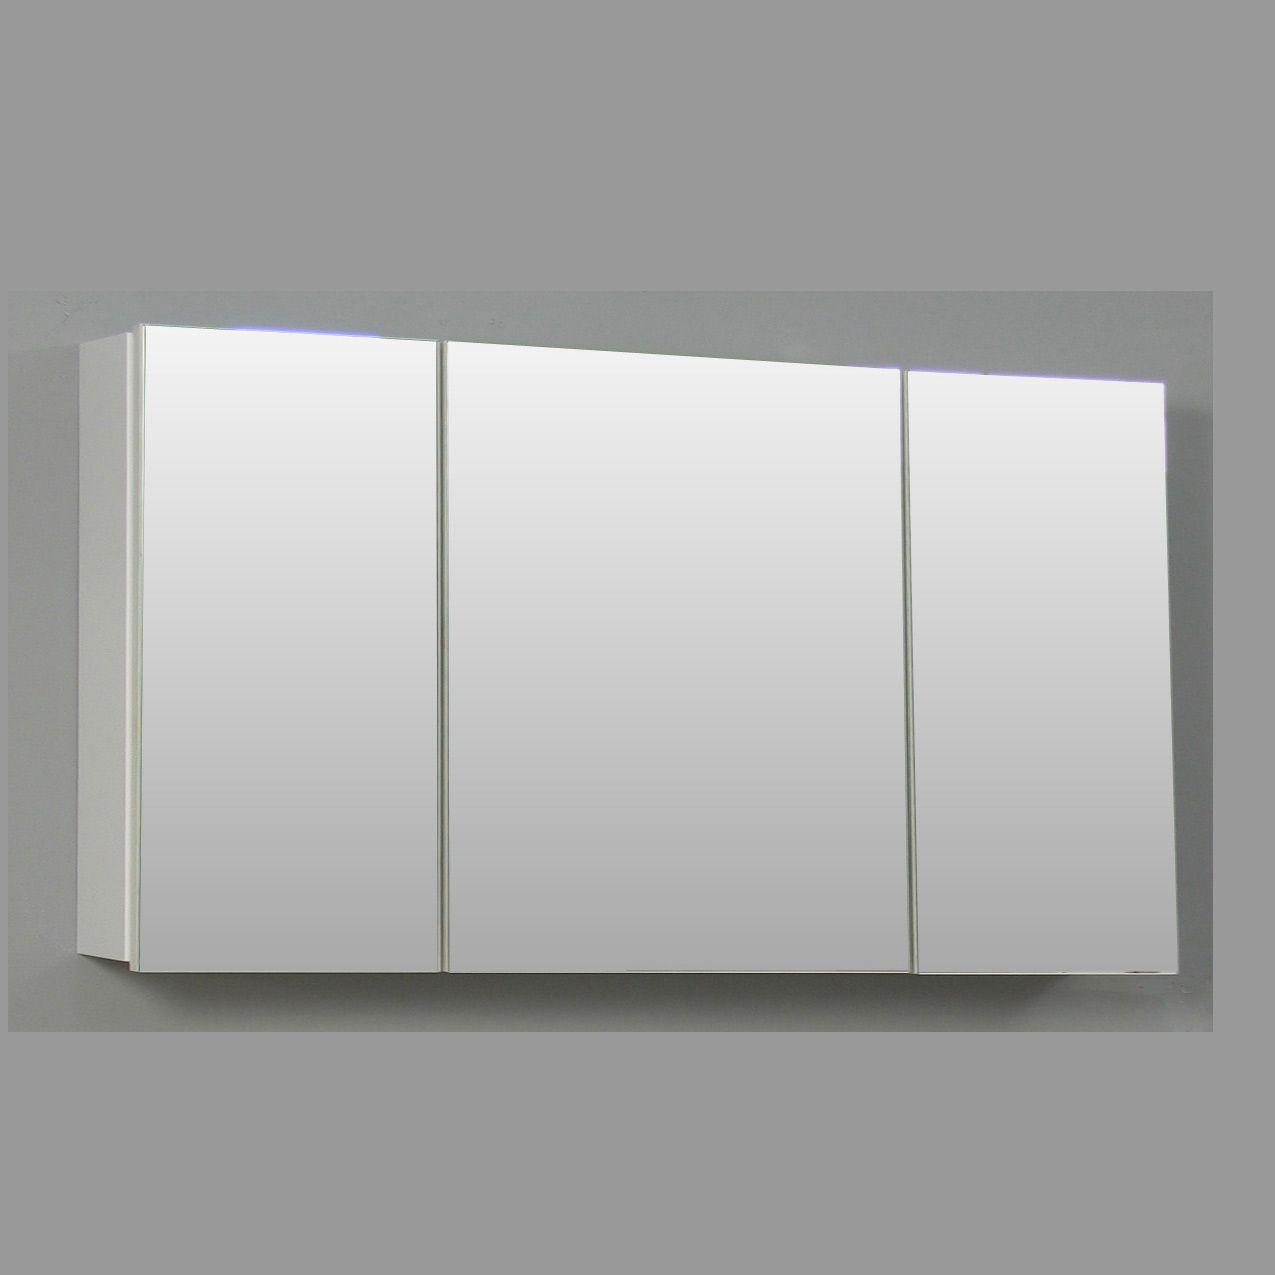 Spiegelkast badkamer 100 cm badkamer kids pinterest for Spiegelkast 60 cm badkamer